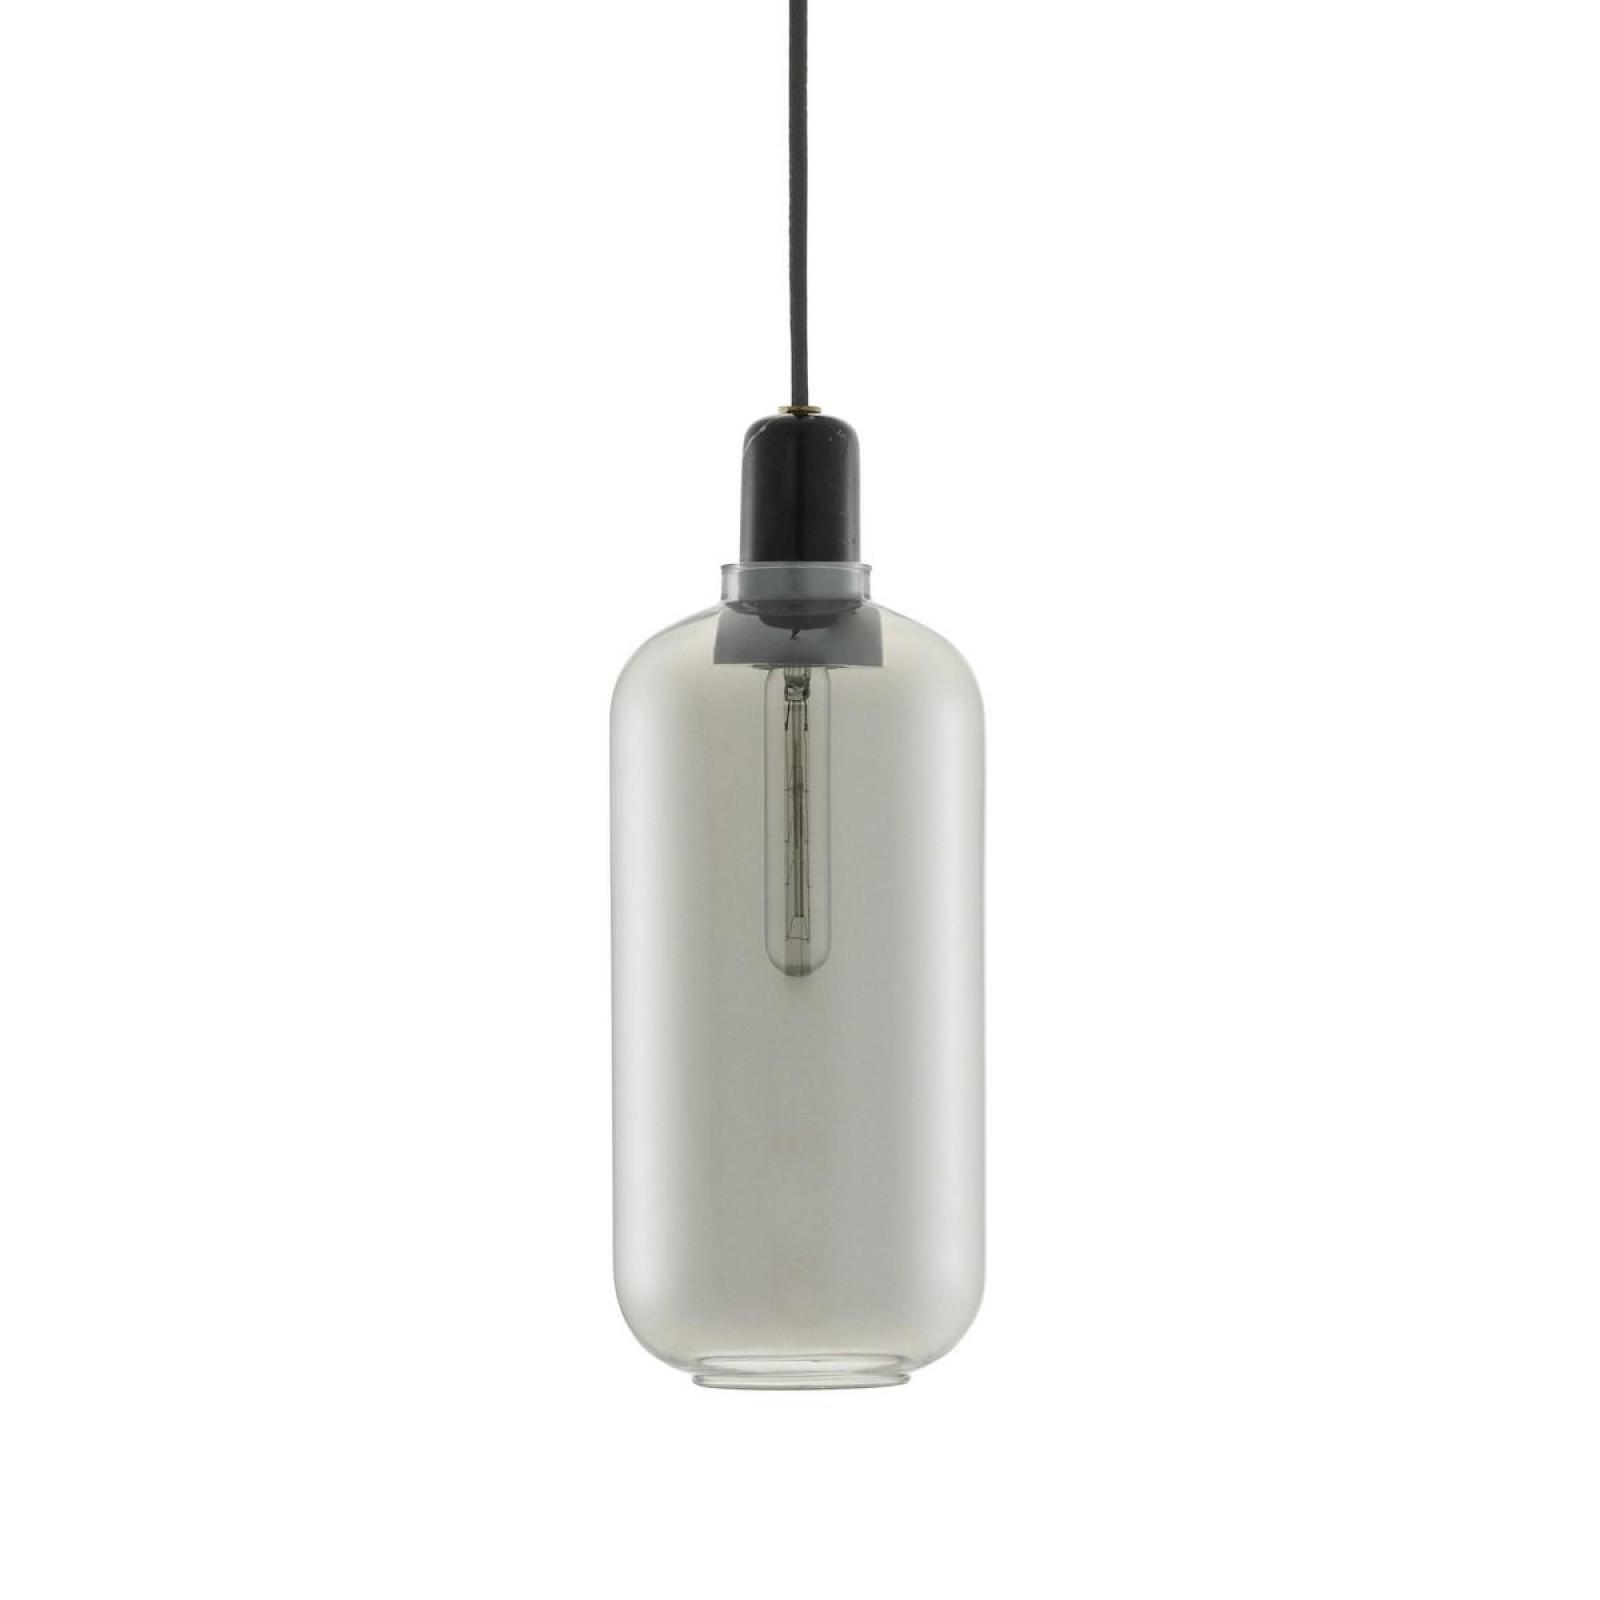 Amp Lamp Large (Smoke / Black) - Normann Copenhagen